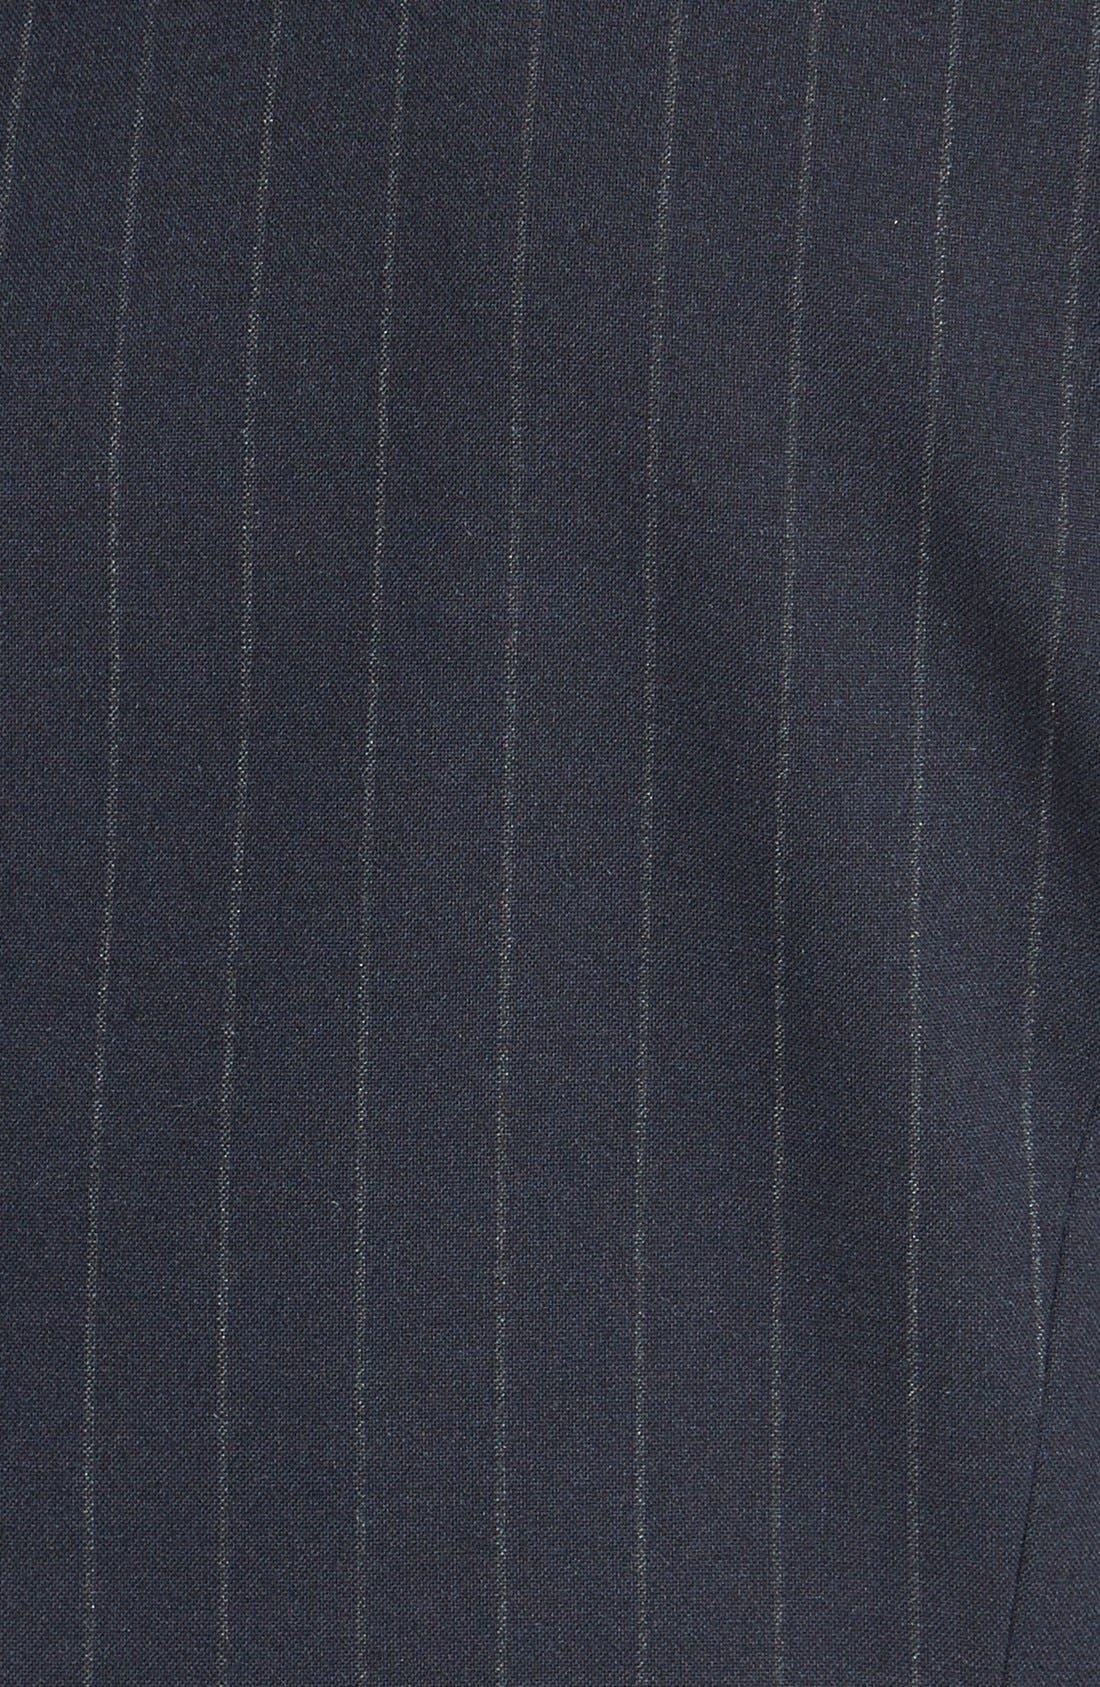 Alternate Image 3  - Vince Camuto One-Button Pinstripe Blazer